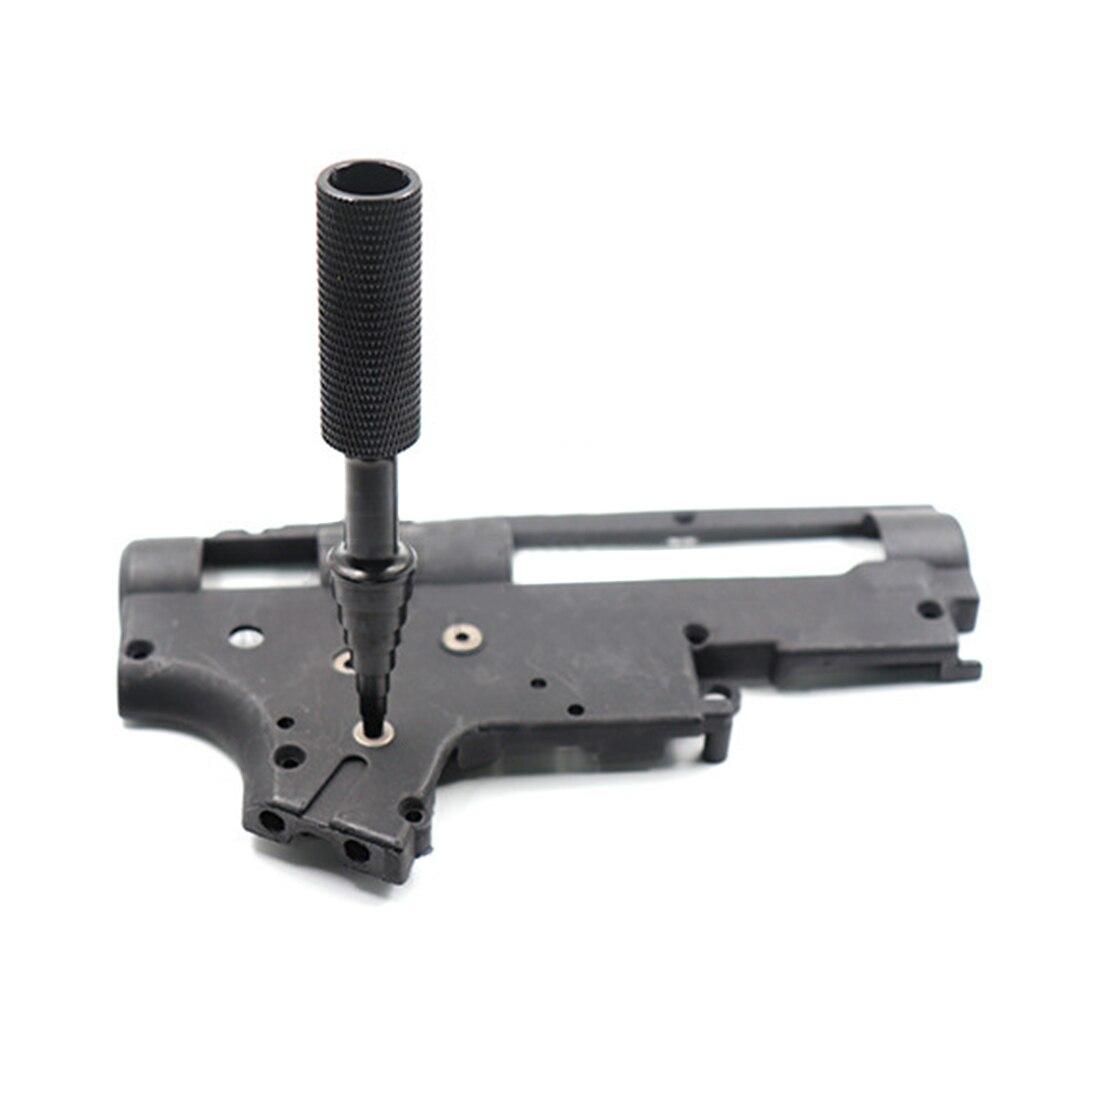 Bearings Quick Ejecter Puller For Water Gel Beads For JM Gen.8/9/JM Gen.10 Gearbox  6mm/7mm/8mm Bearings Disassembly - Black